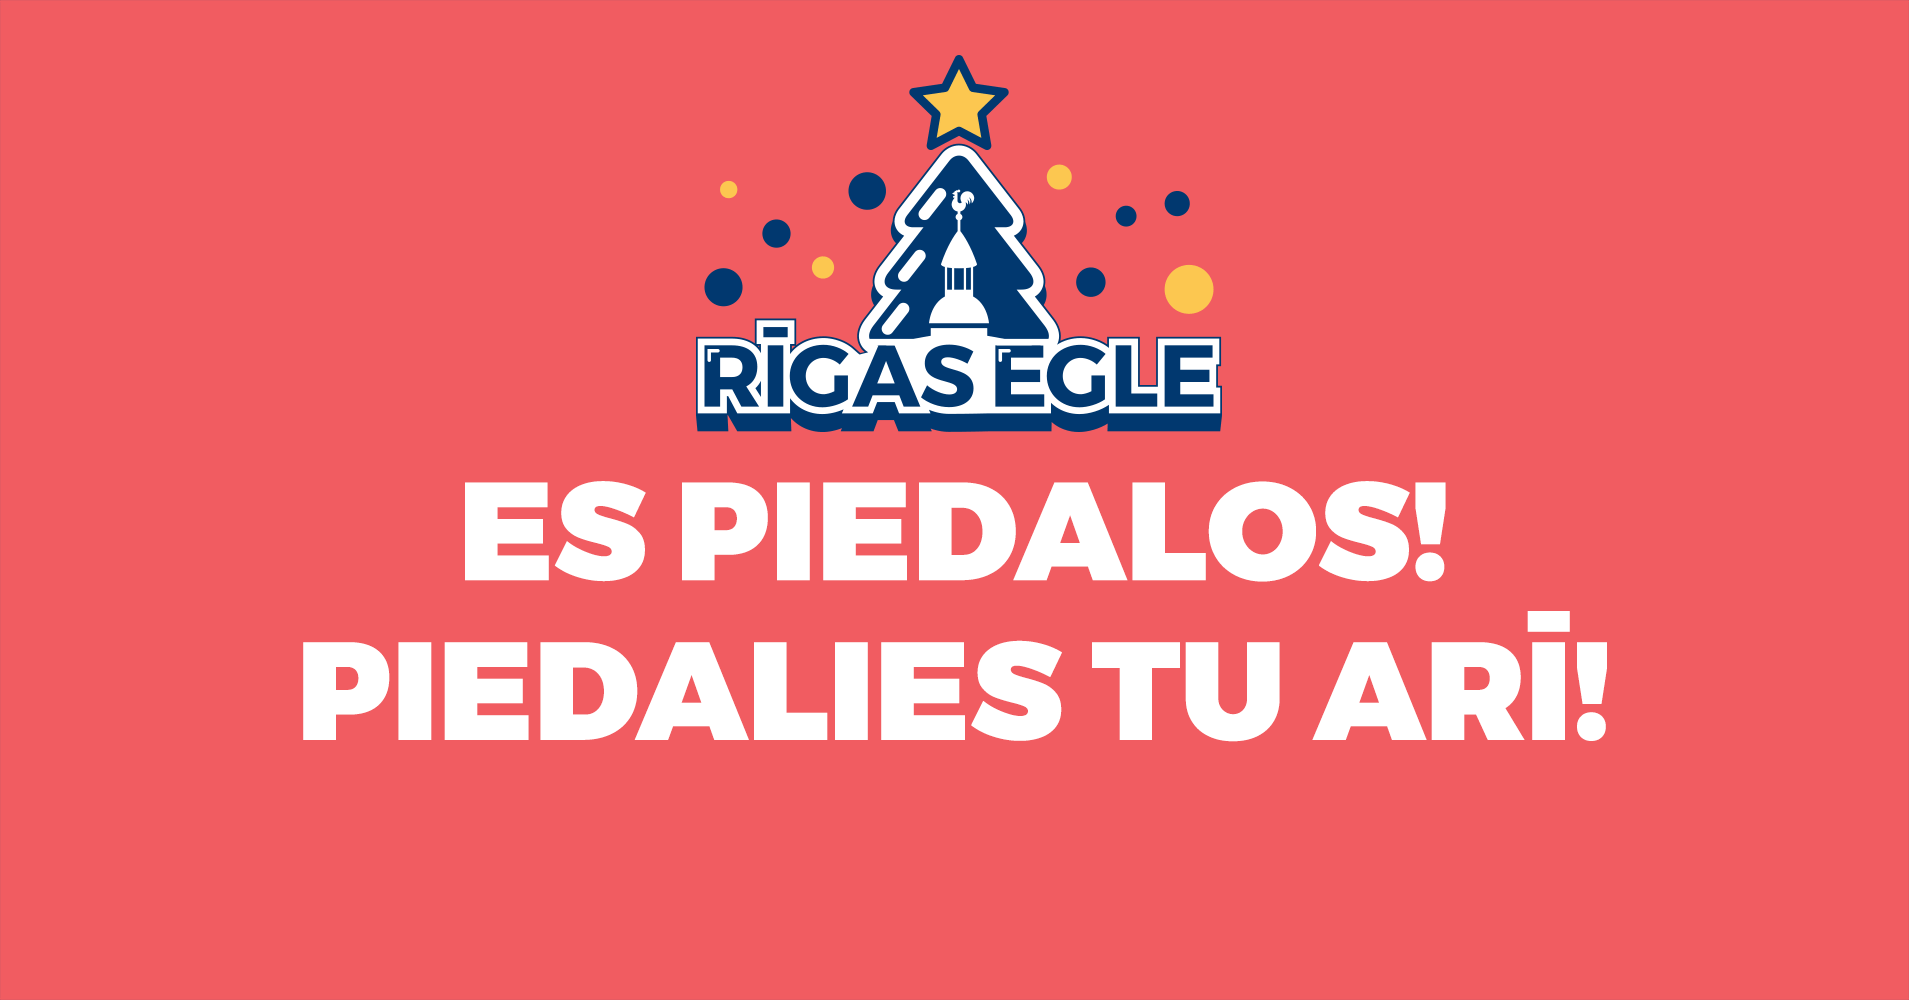 rigas_egle_piedalies